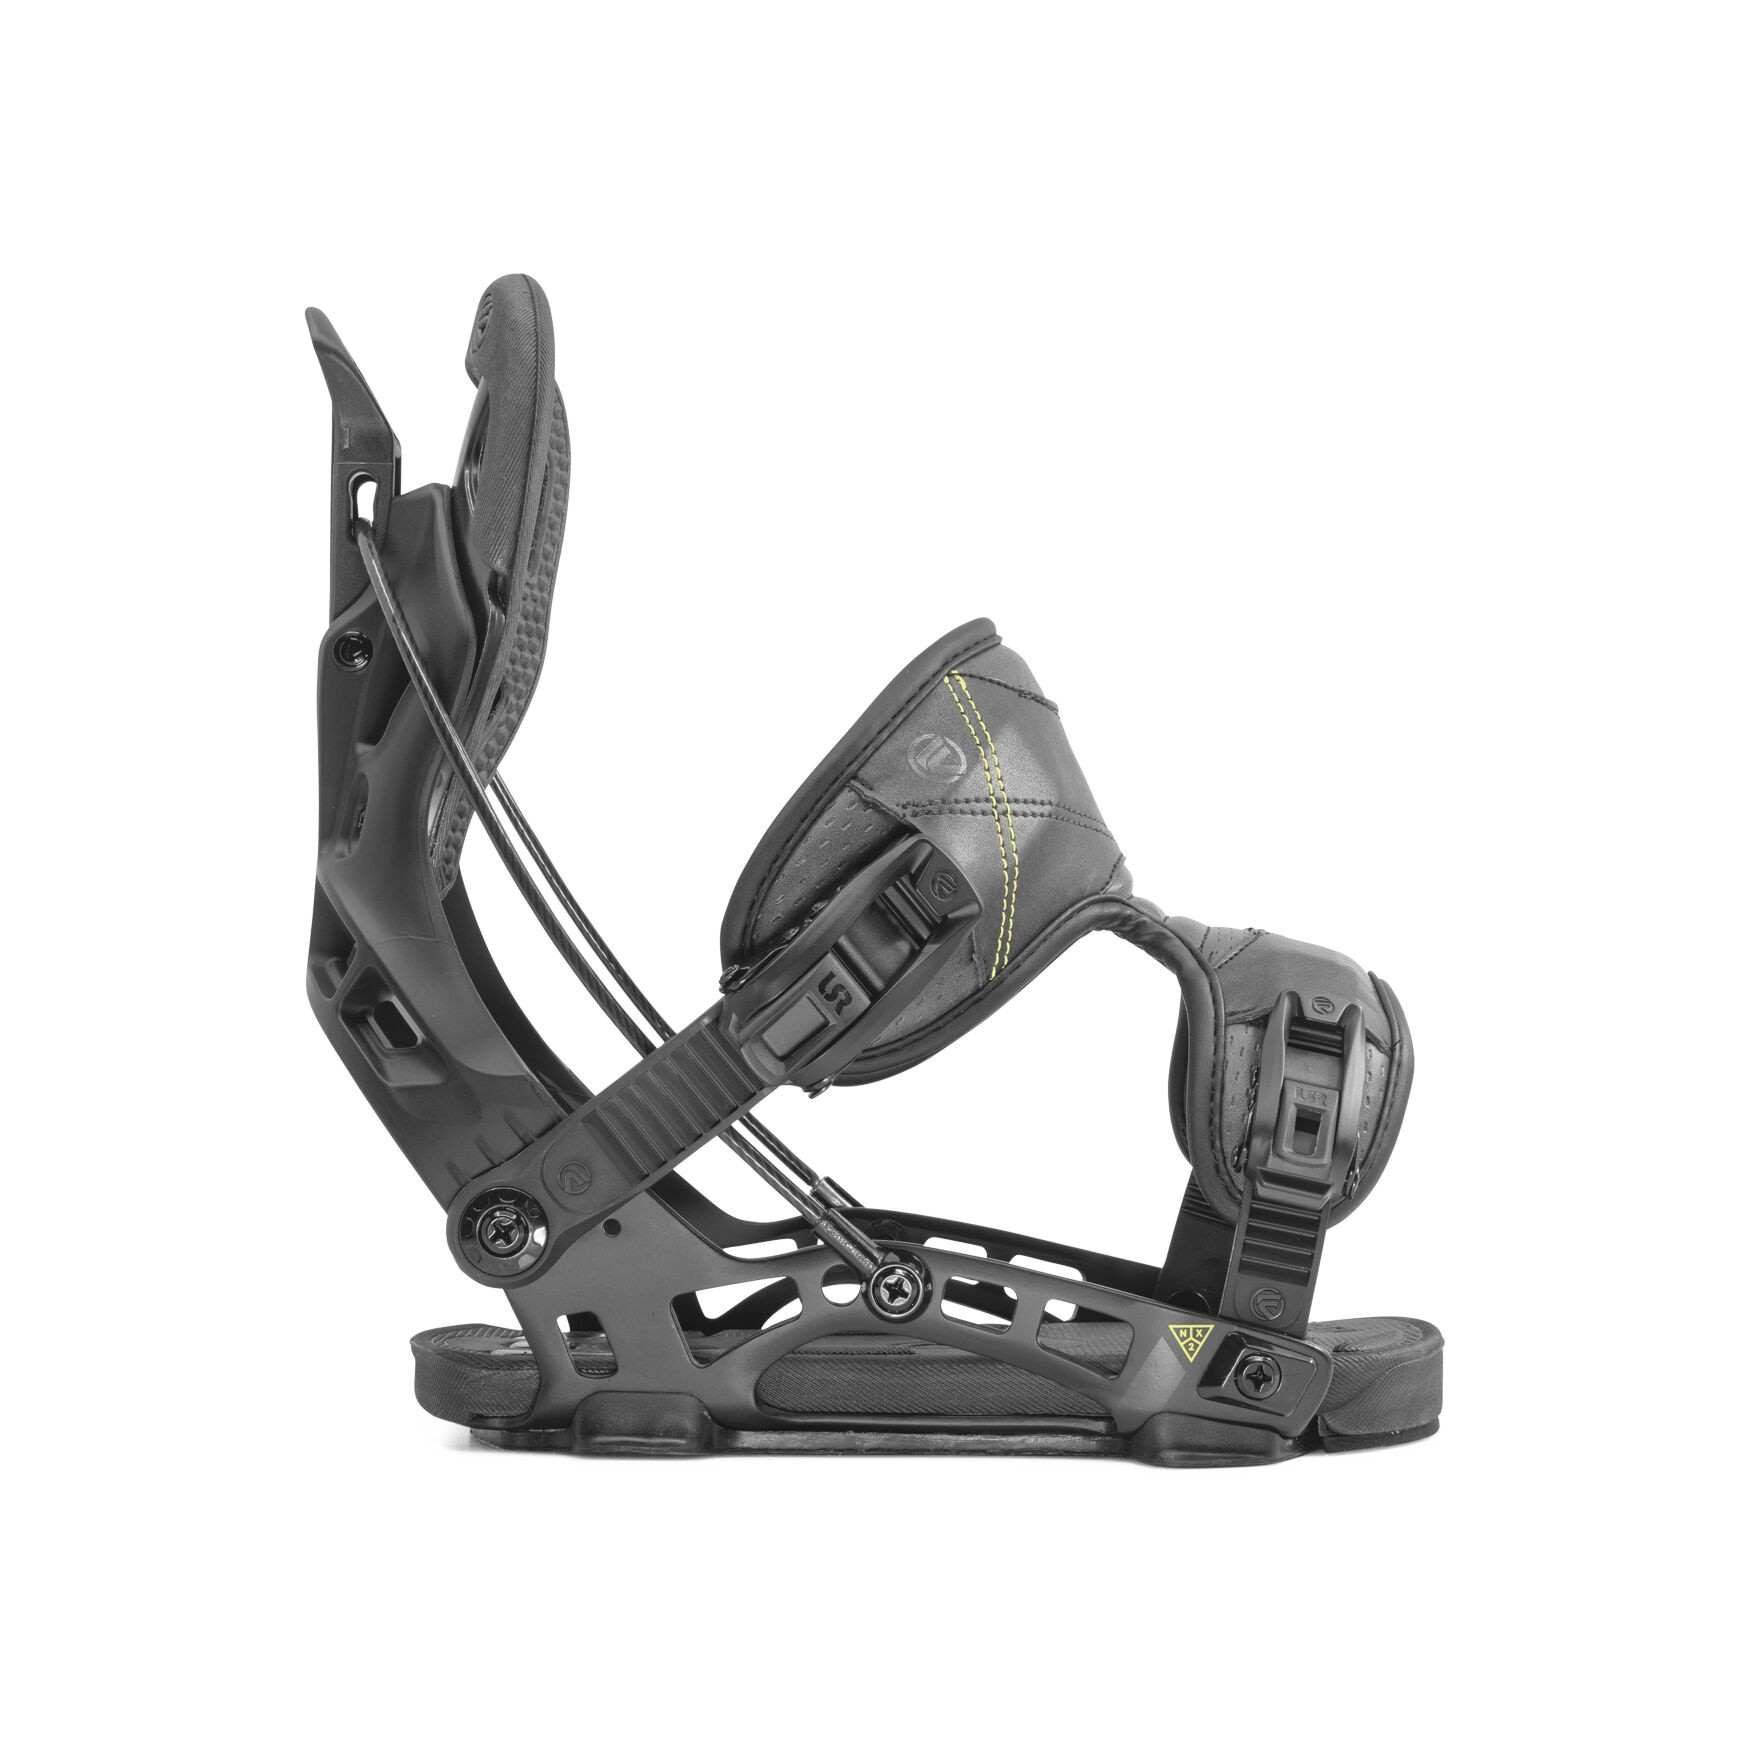 Flow snowboardbinding NX2 Hybrid 2020